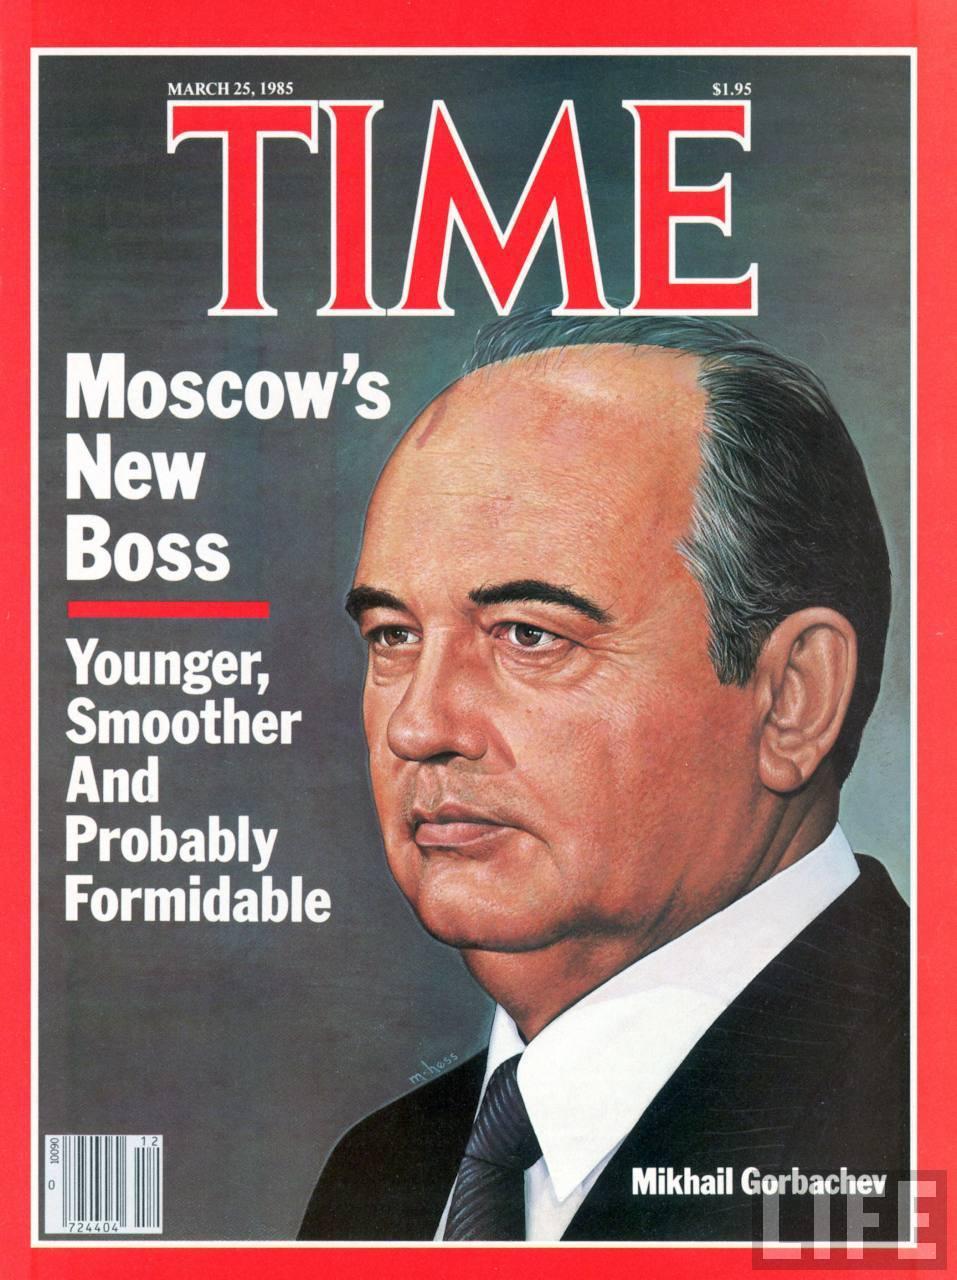 gorbachev1.jpg